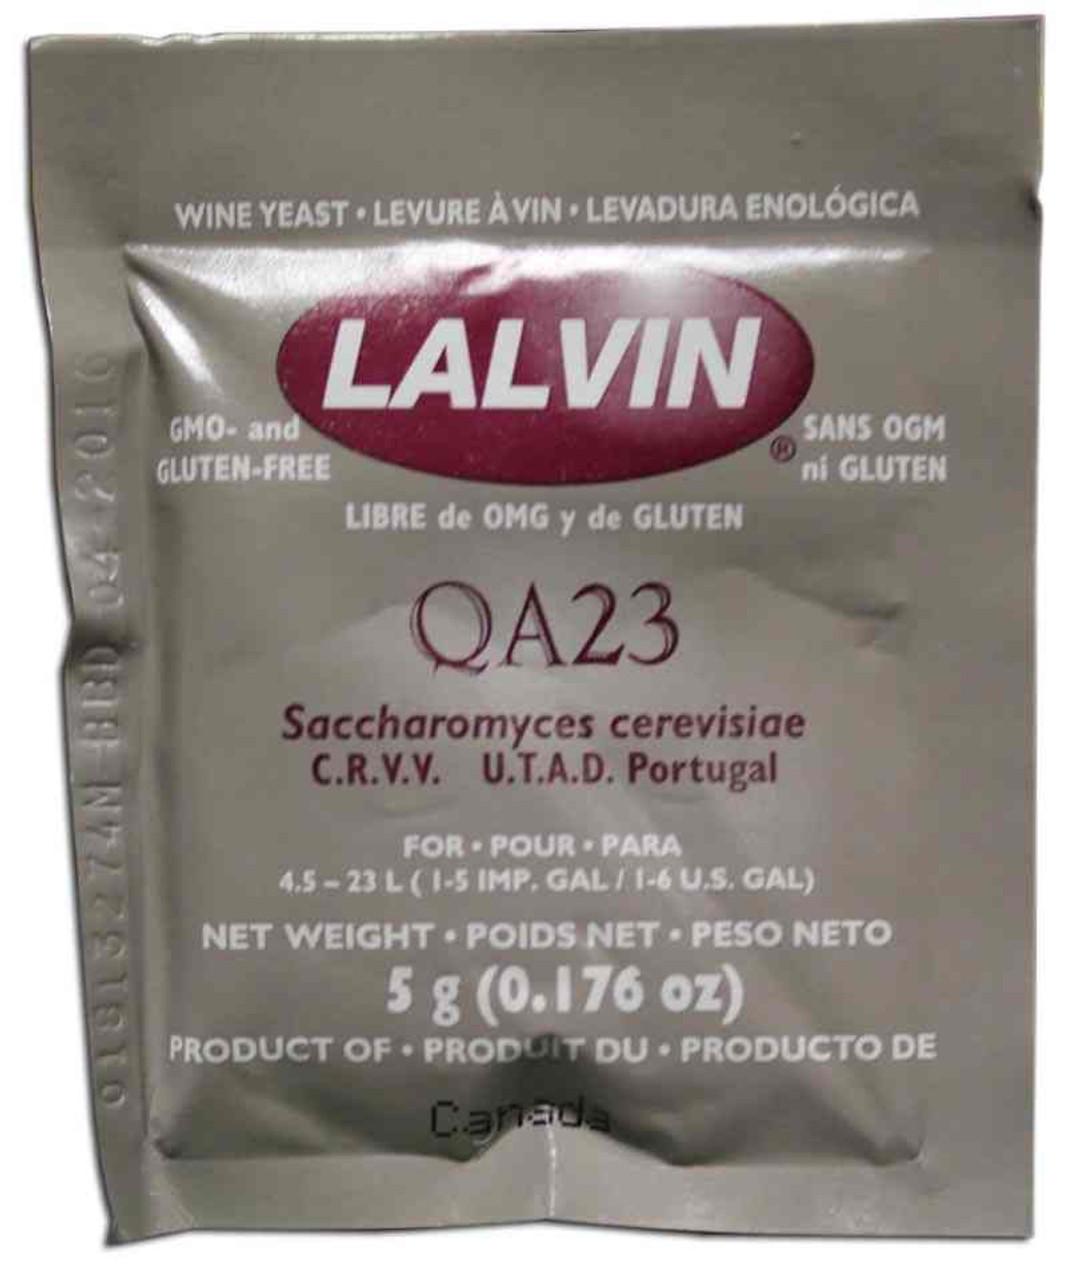 QA23 Lalvin Active Freeze-Dried Wine Yeast